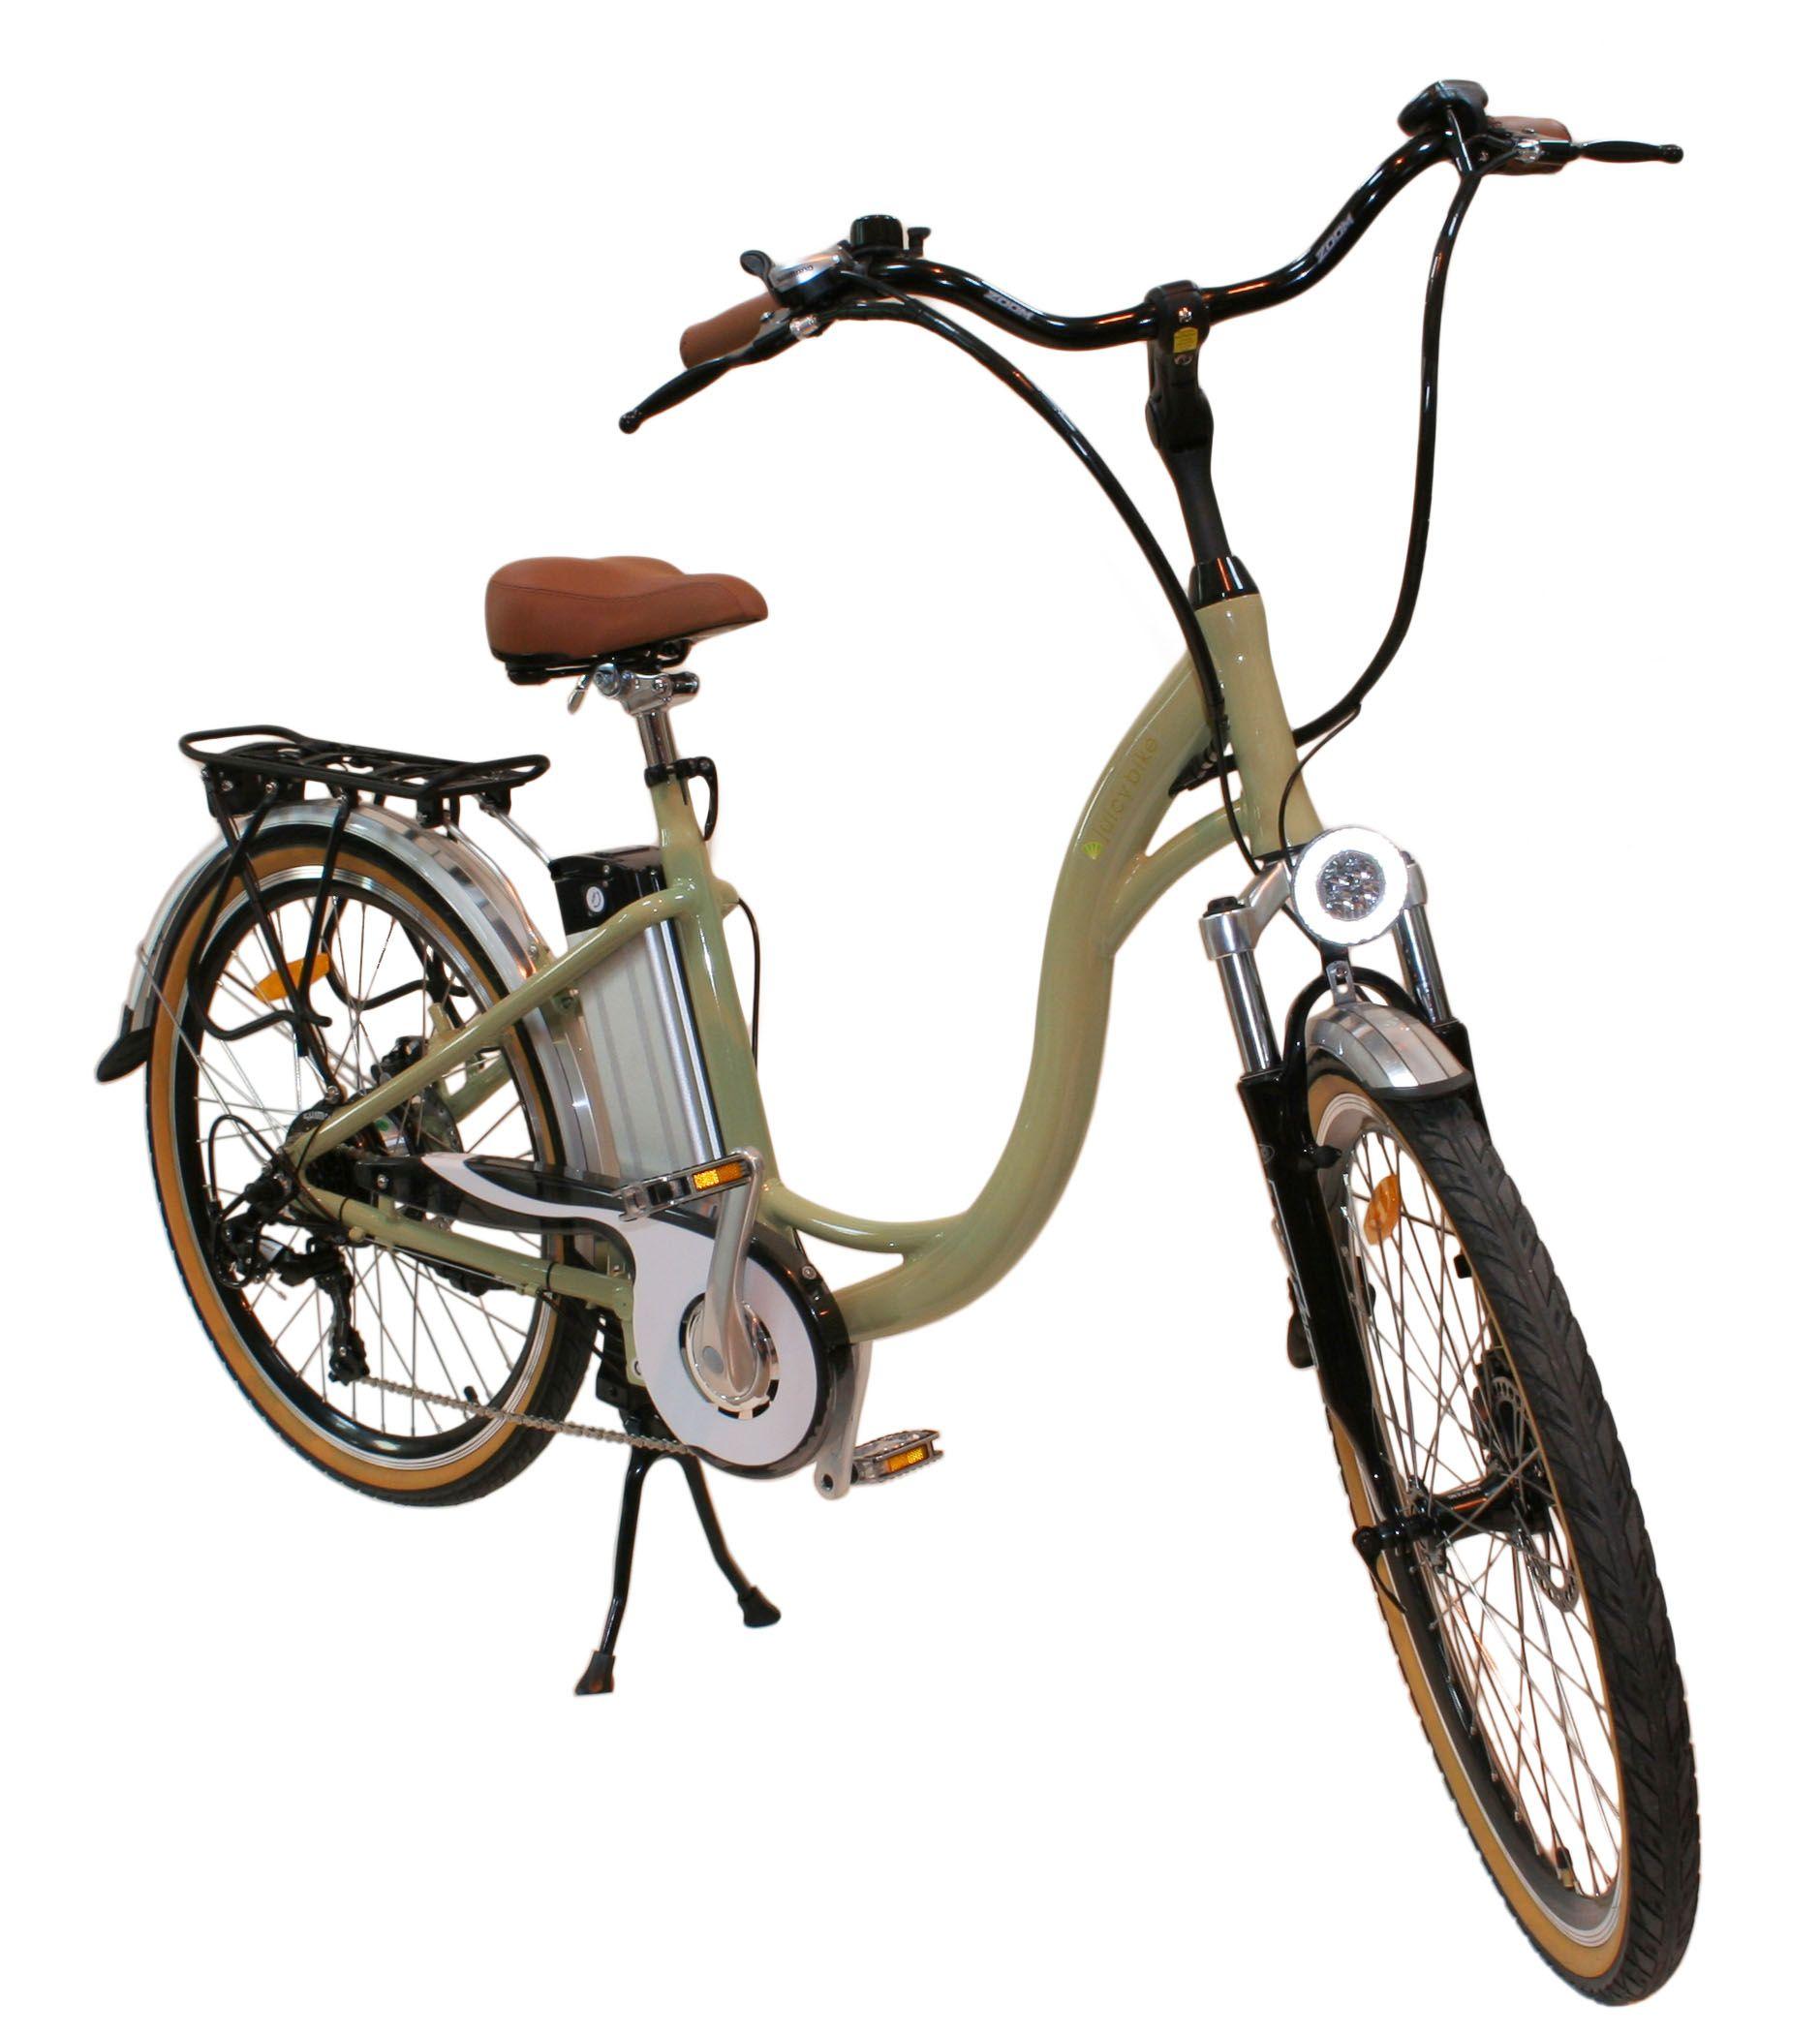 The Juicy Bike Dutch Style Electric Bike Range Electric Bicycle